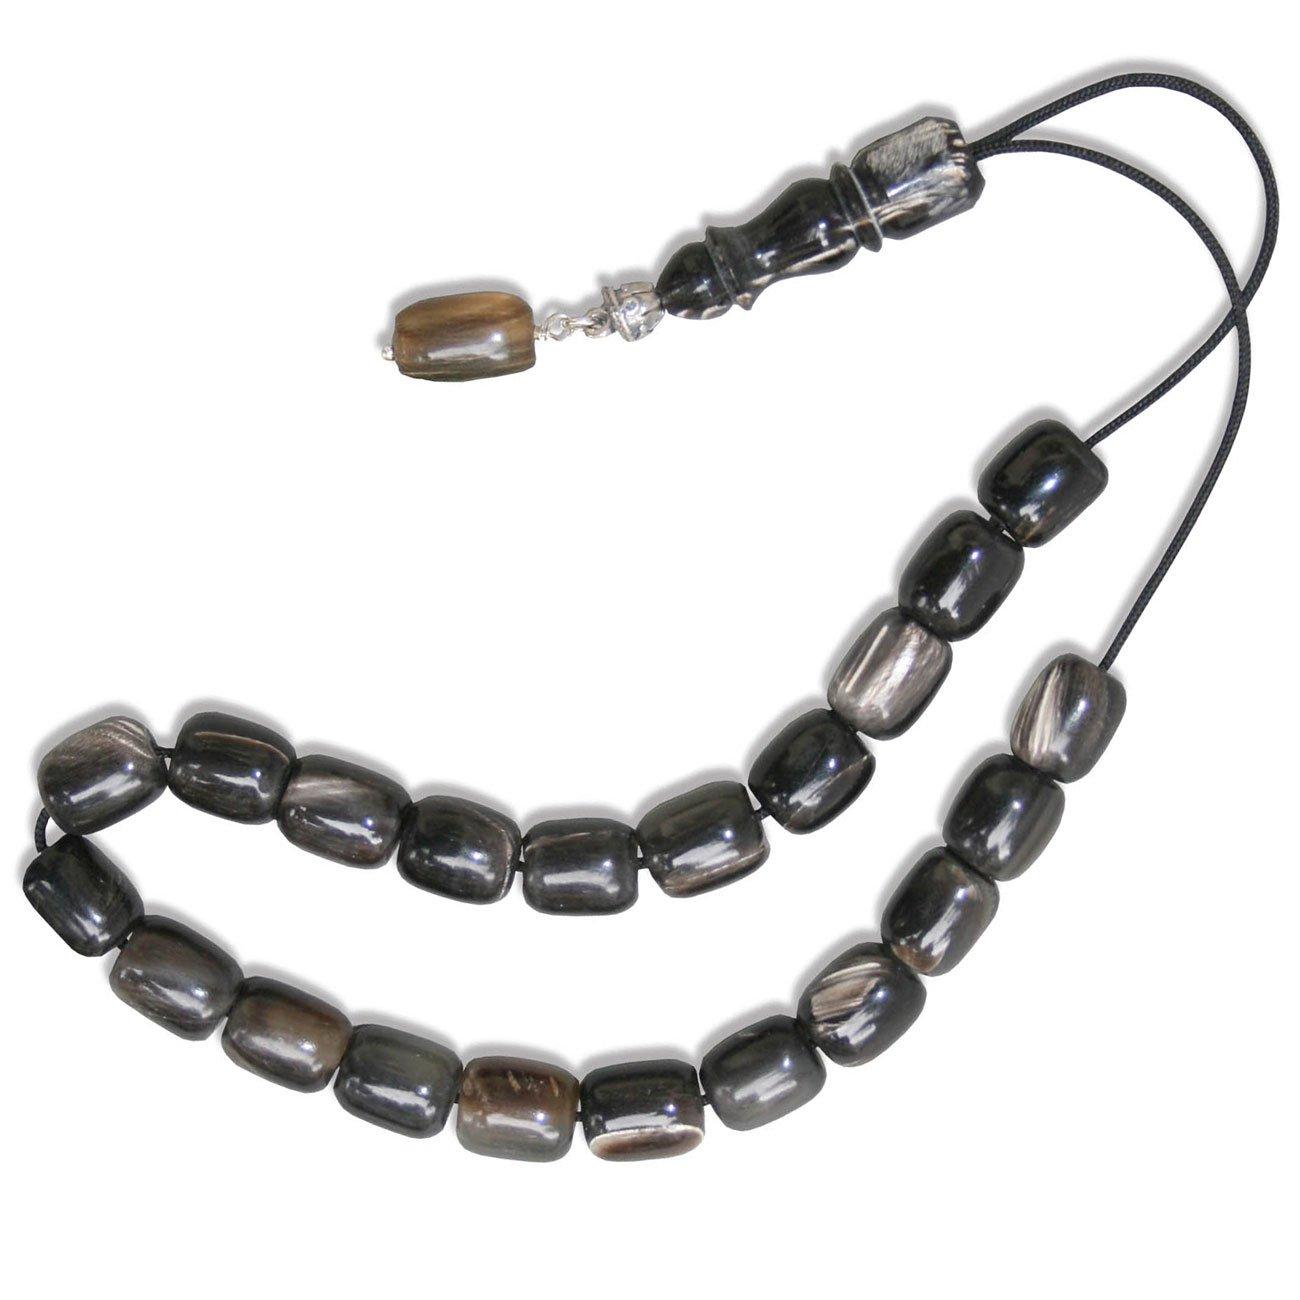 Worry Beads - Komboloi - Natural Bull Horn & Sterling Silver - Barrel Shape